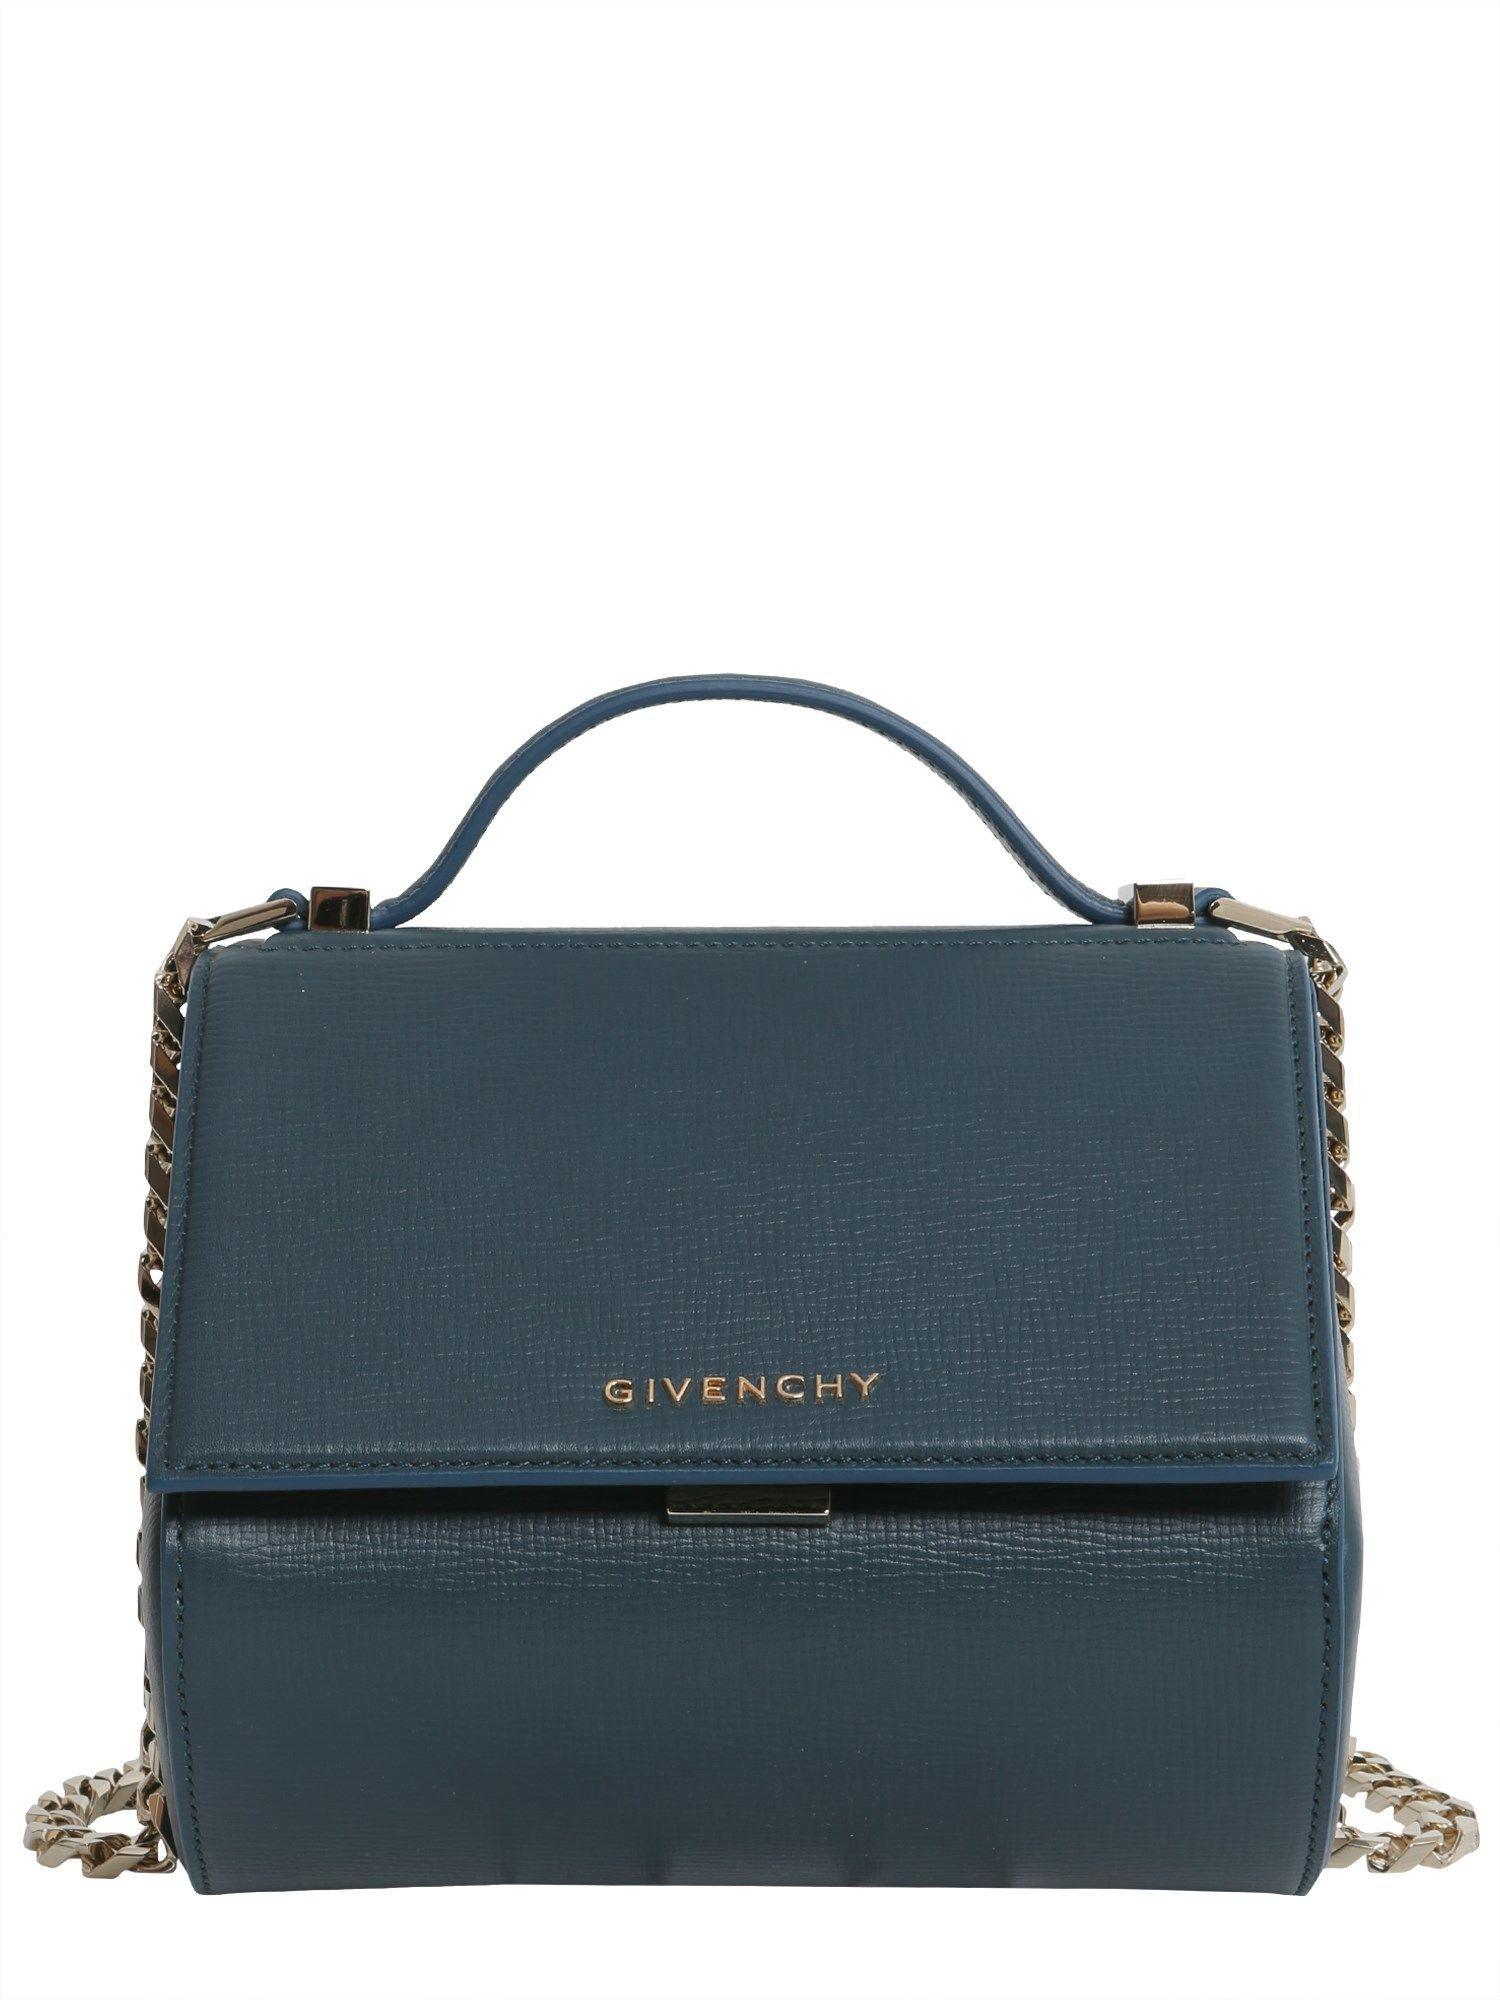 Givenchy Mini Pandora Box Bag In Verde